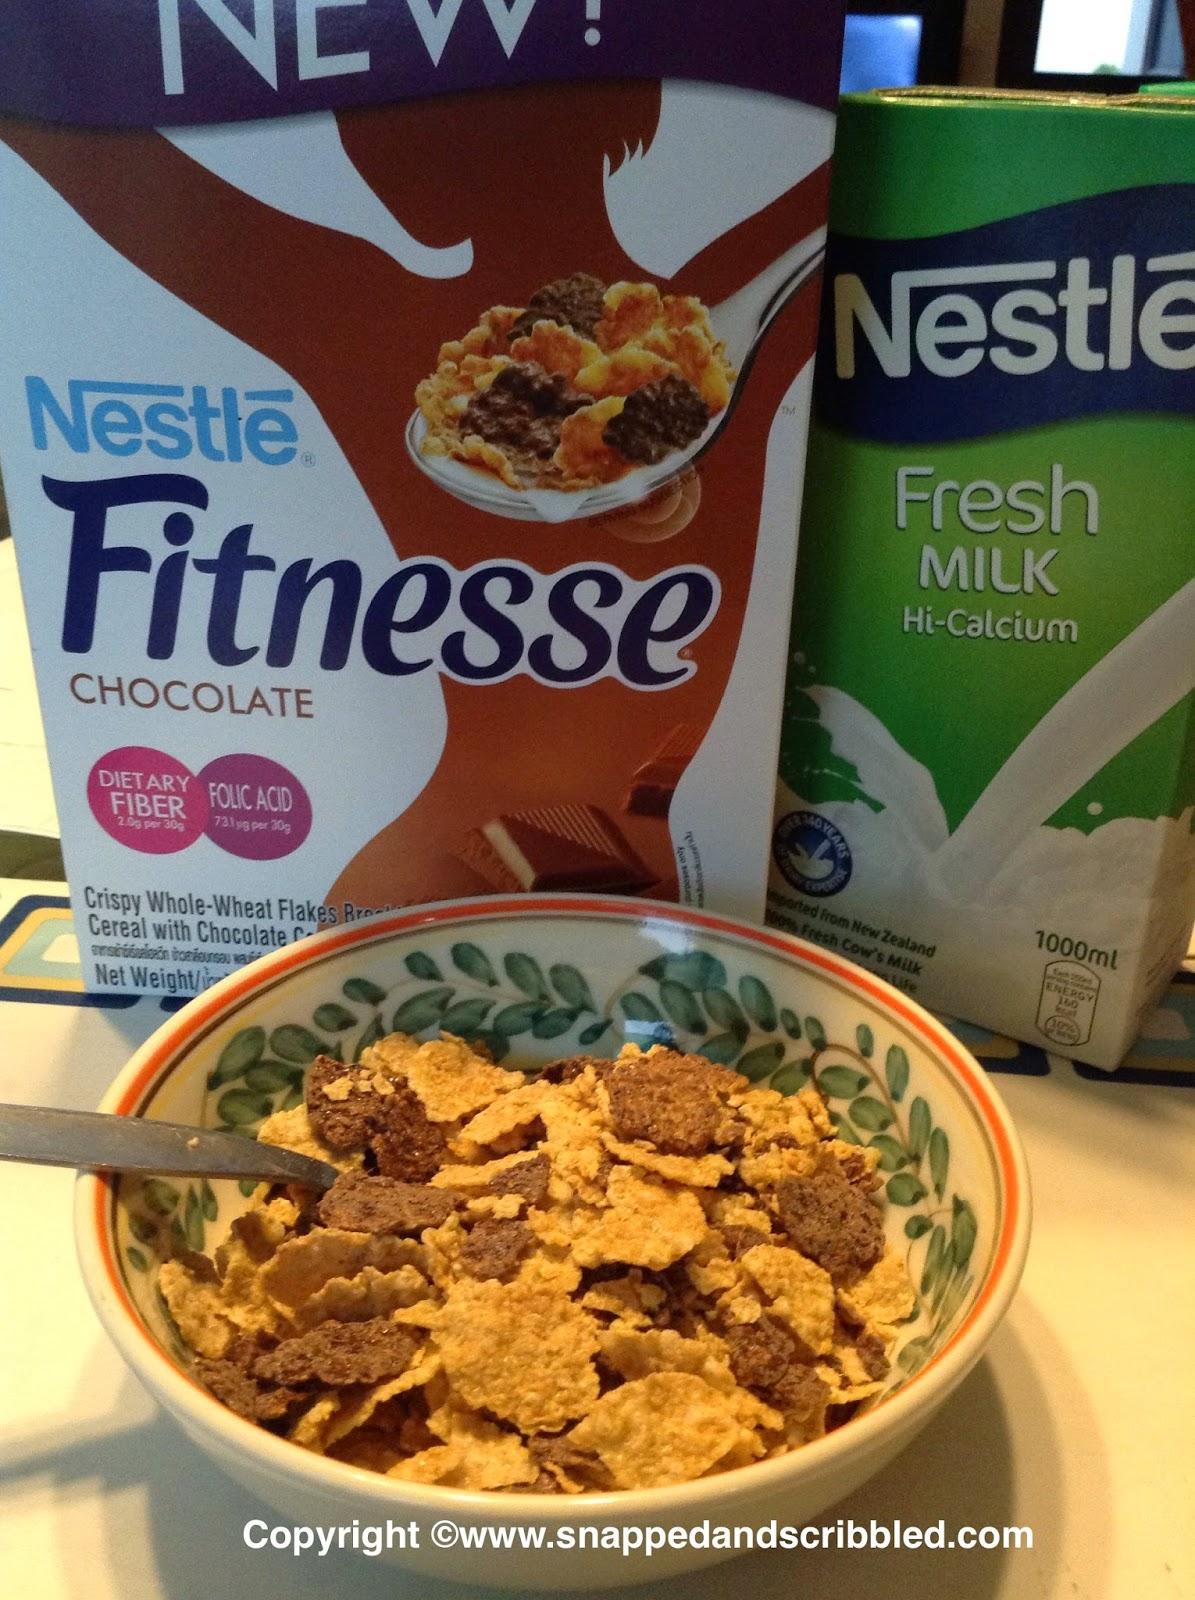 Healthy Breakfast: Nestle Fitnesse Chocolate